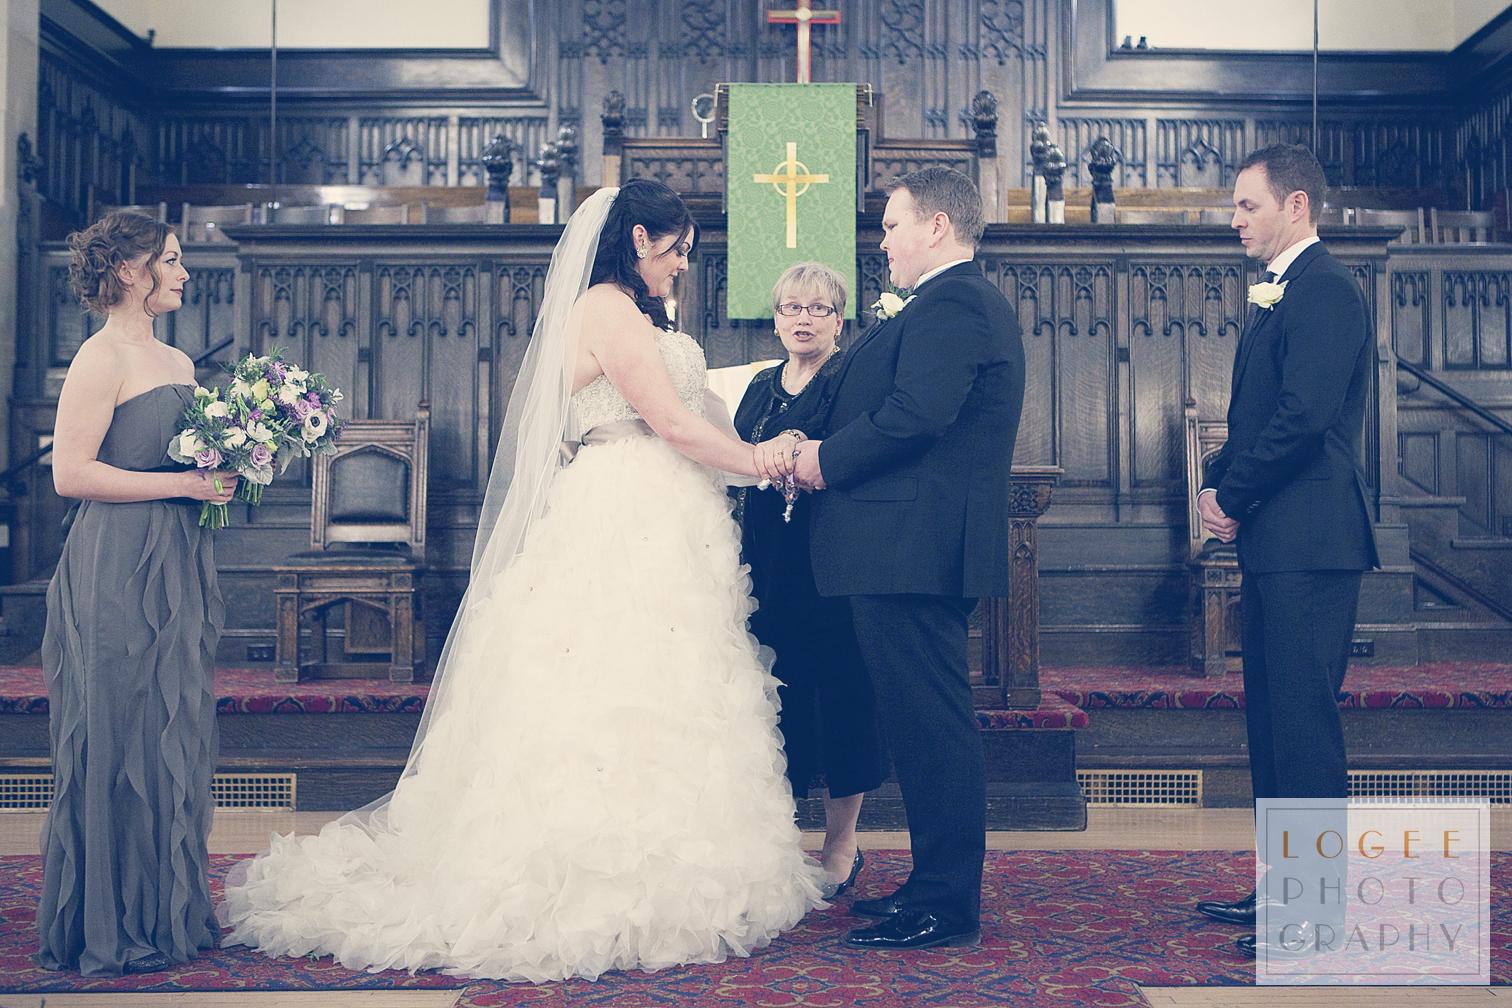 McIntosh-Burns Wedding - 6739Cw